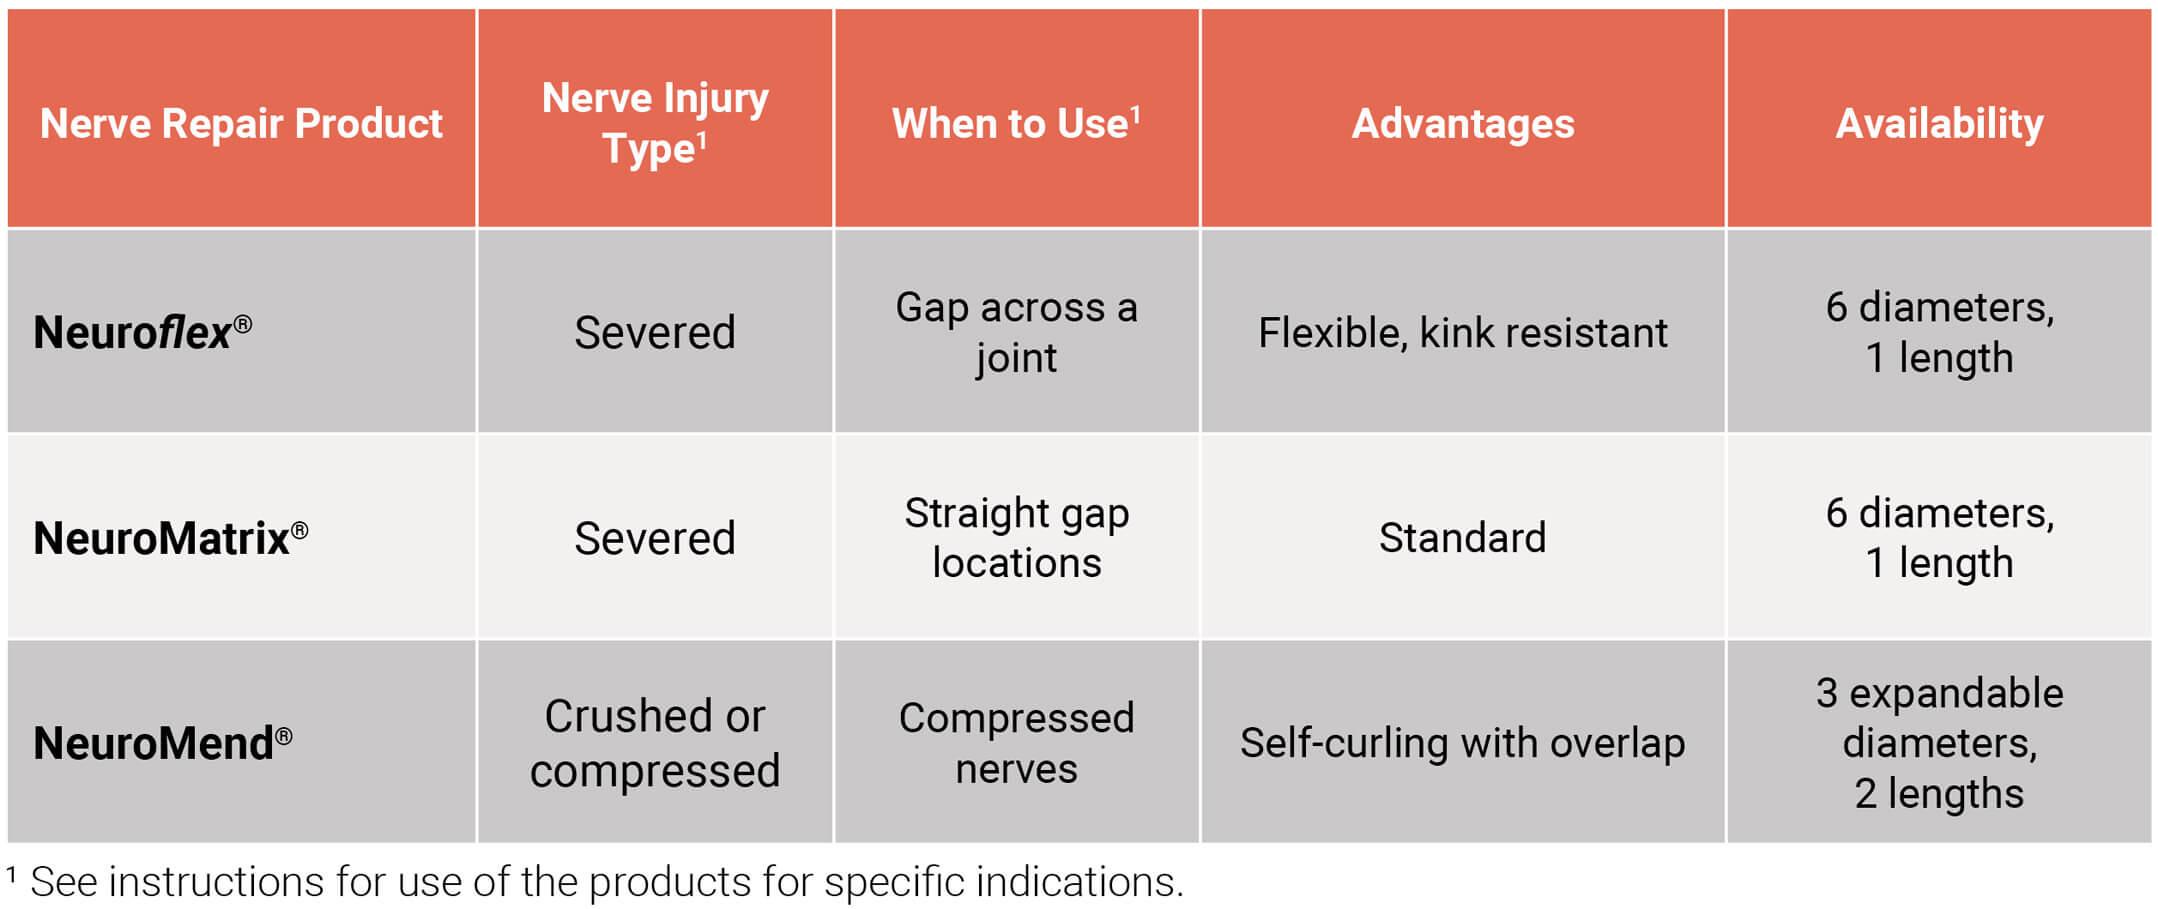 cmx-nerve-repair-chart-lg